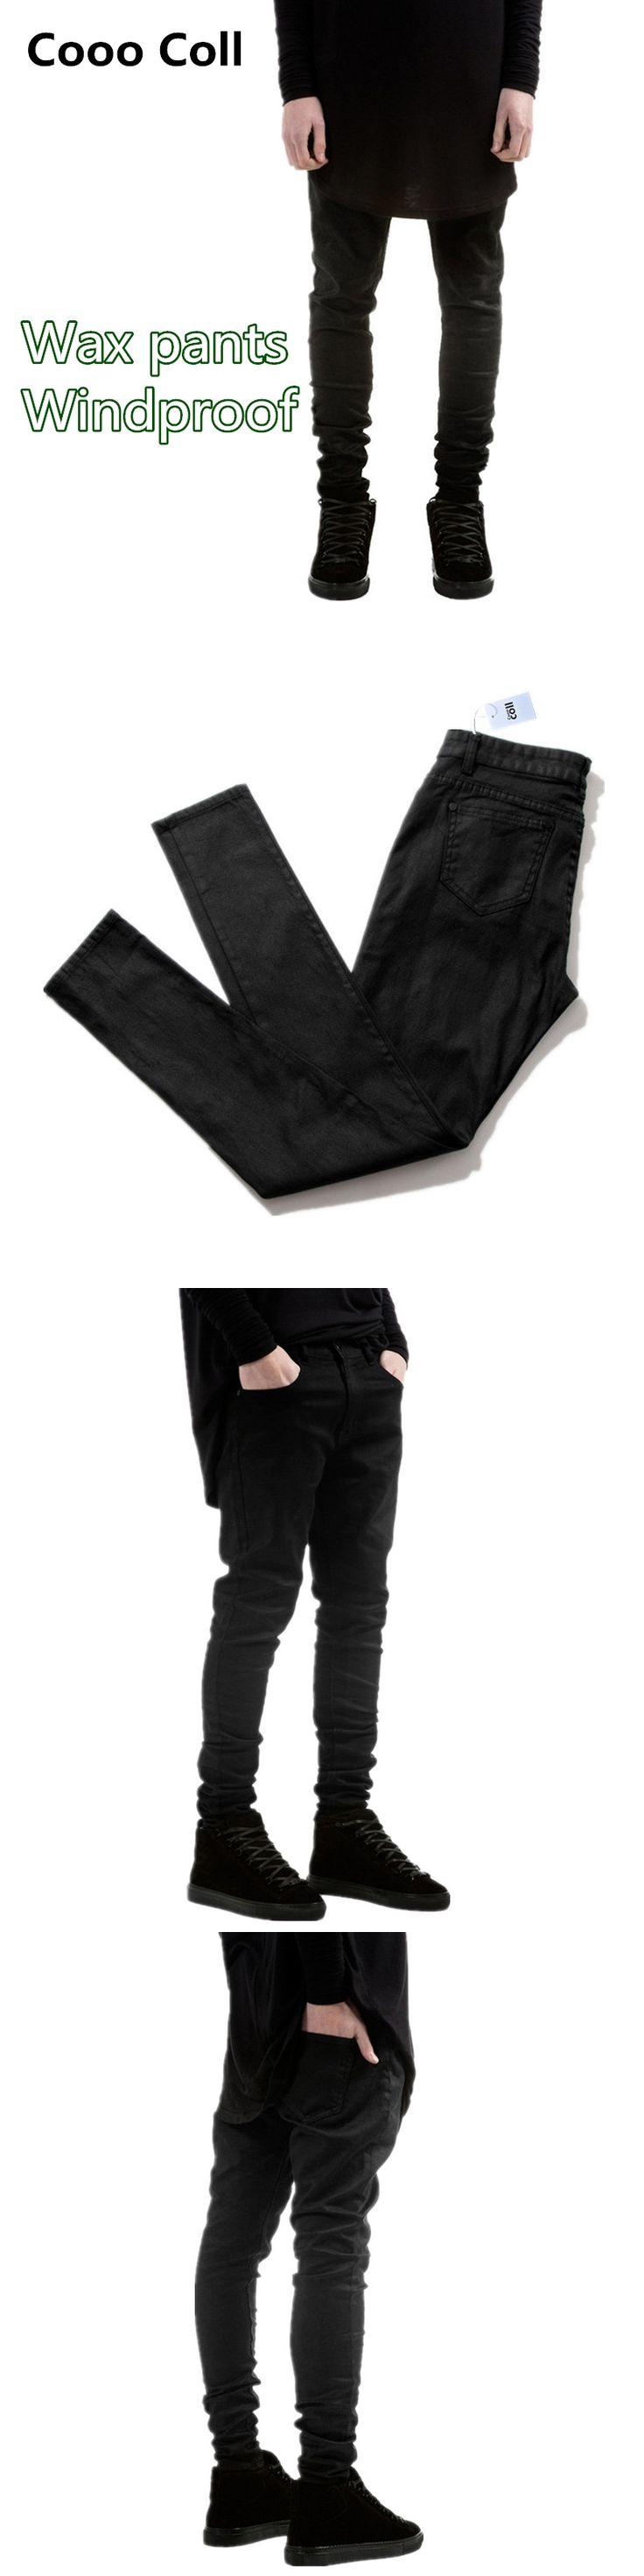 Men's Wax  Jeans pants Kanye west Chris Brown swag Skateboard Diamond pants Hight Street Free Justing bieber Cooo Coll